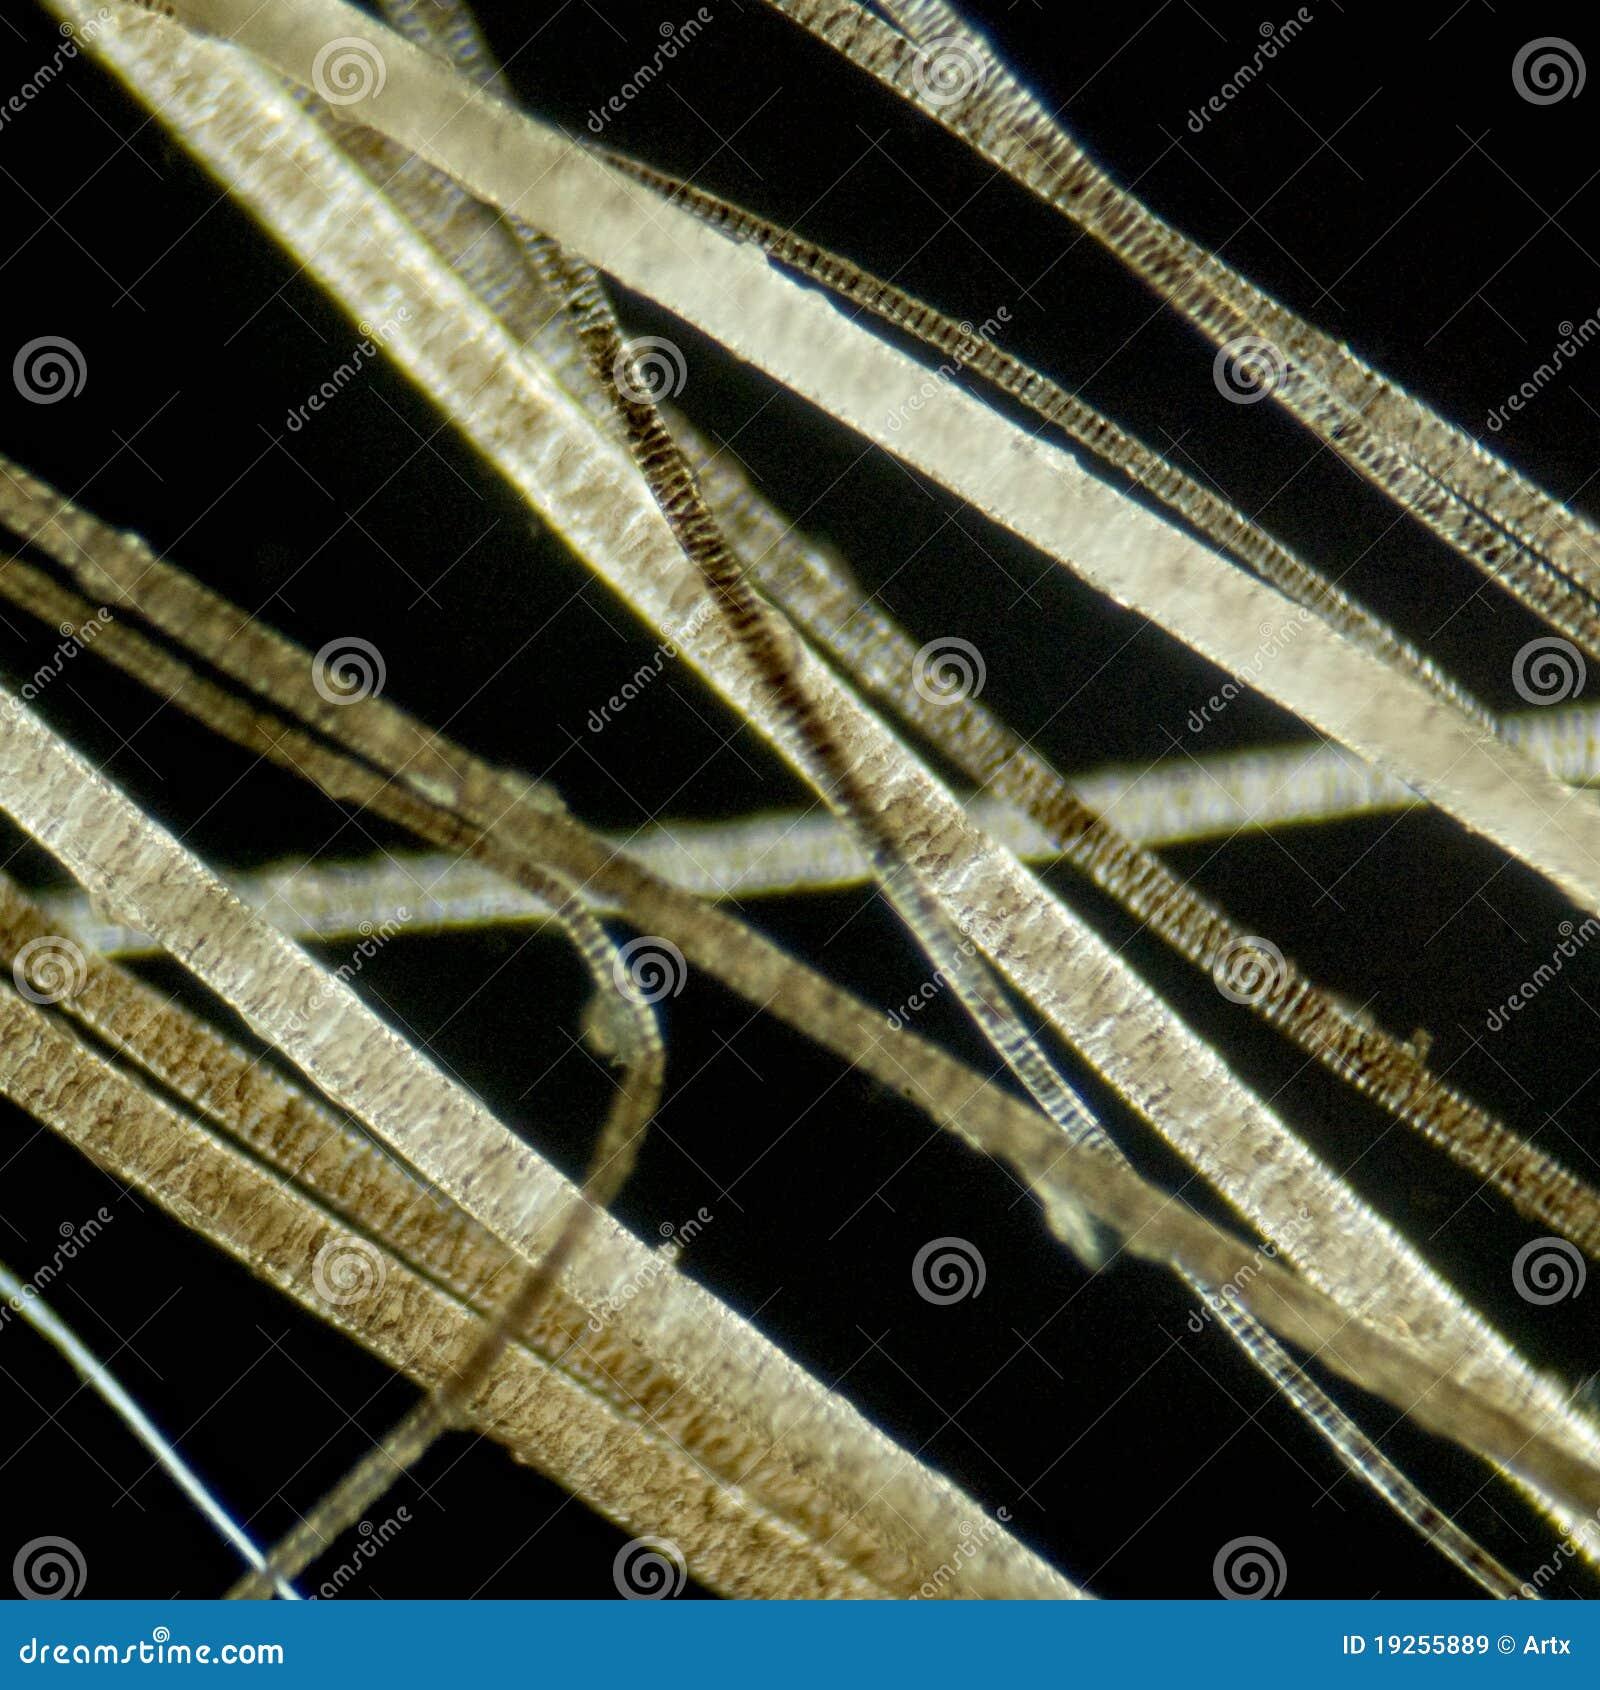 Hair under microscope